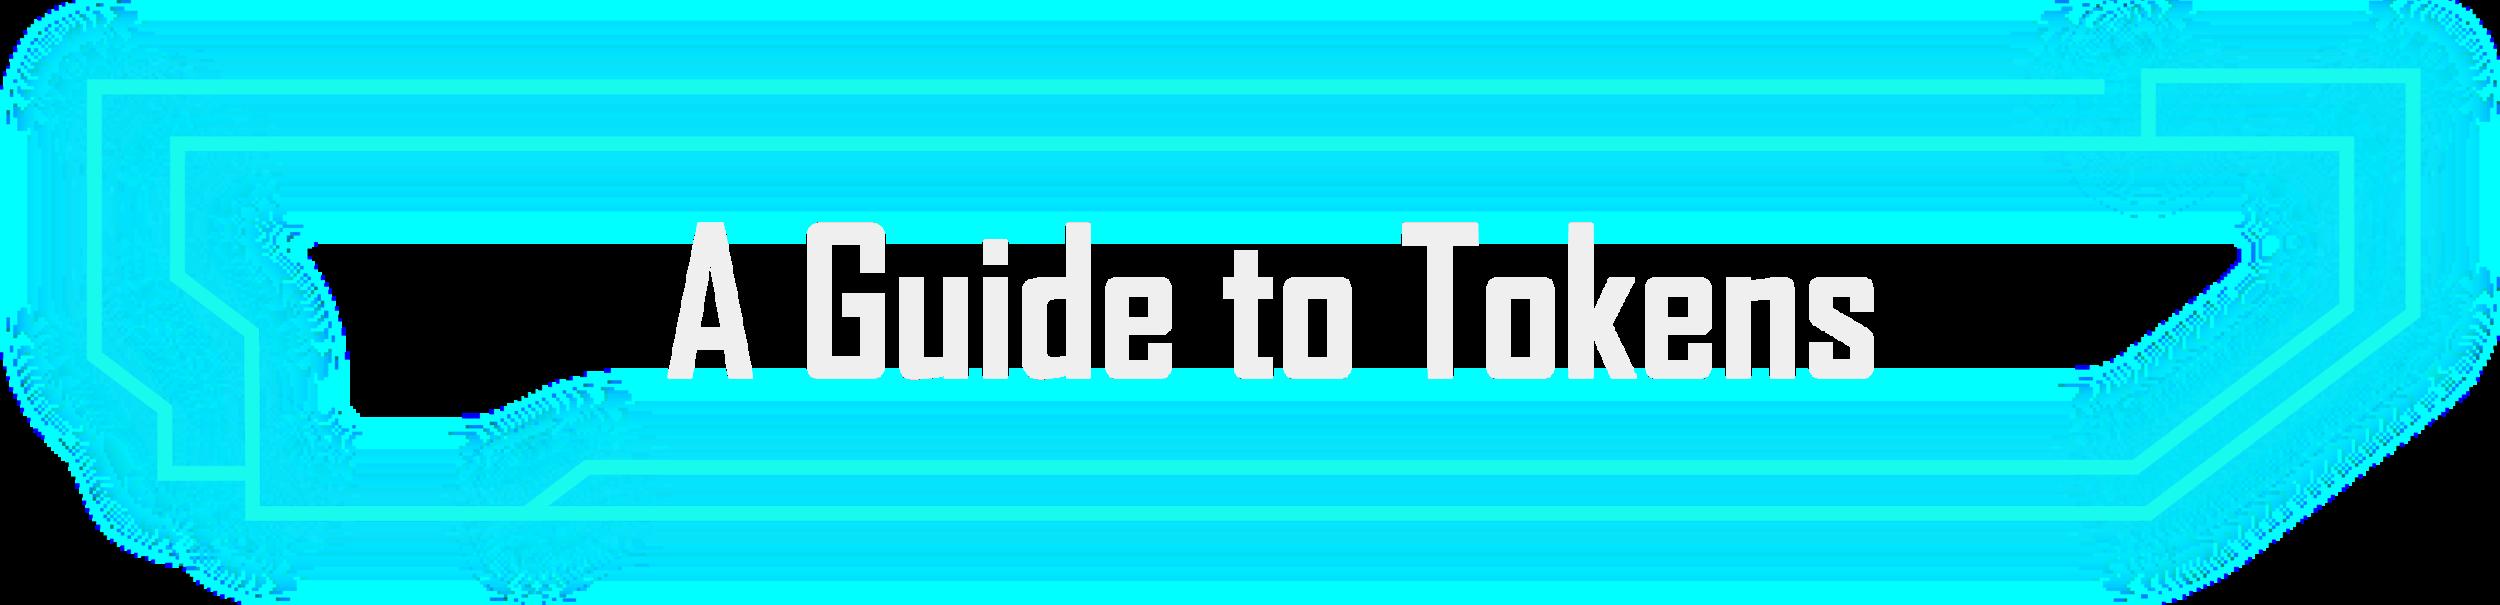 Token Guide-06.png